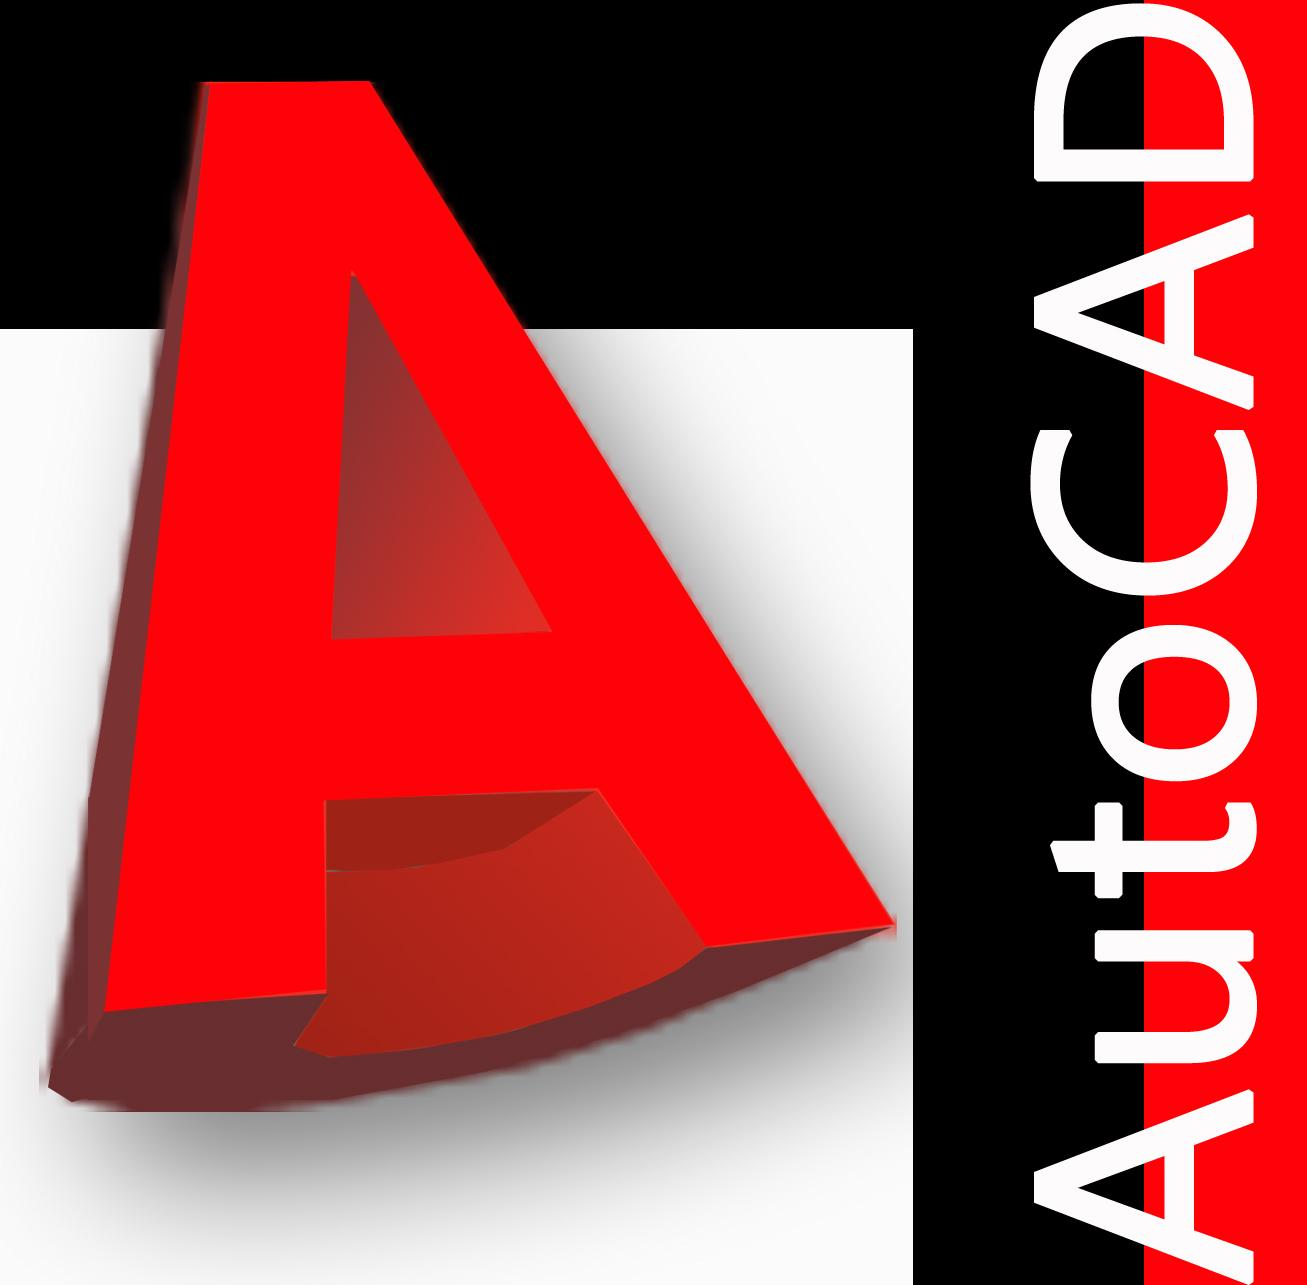 Autocad Logo - Logo Autocad PNG